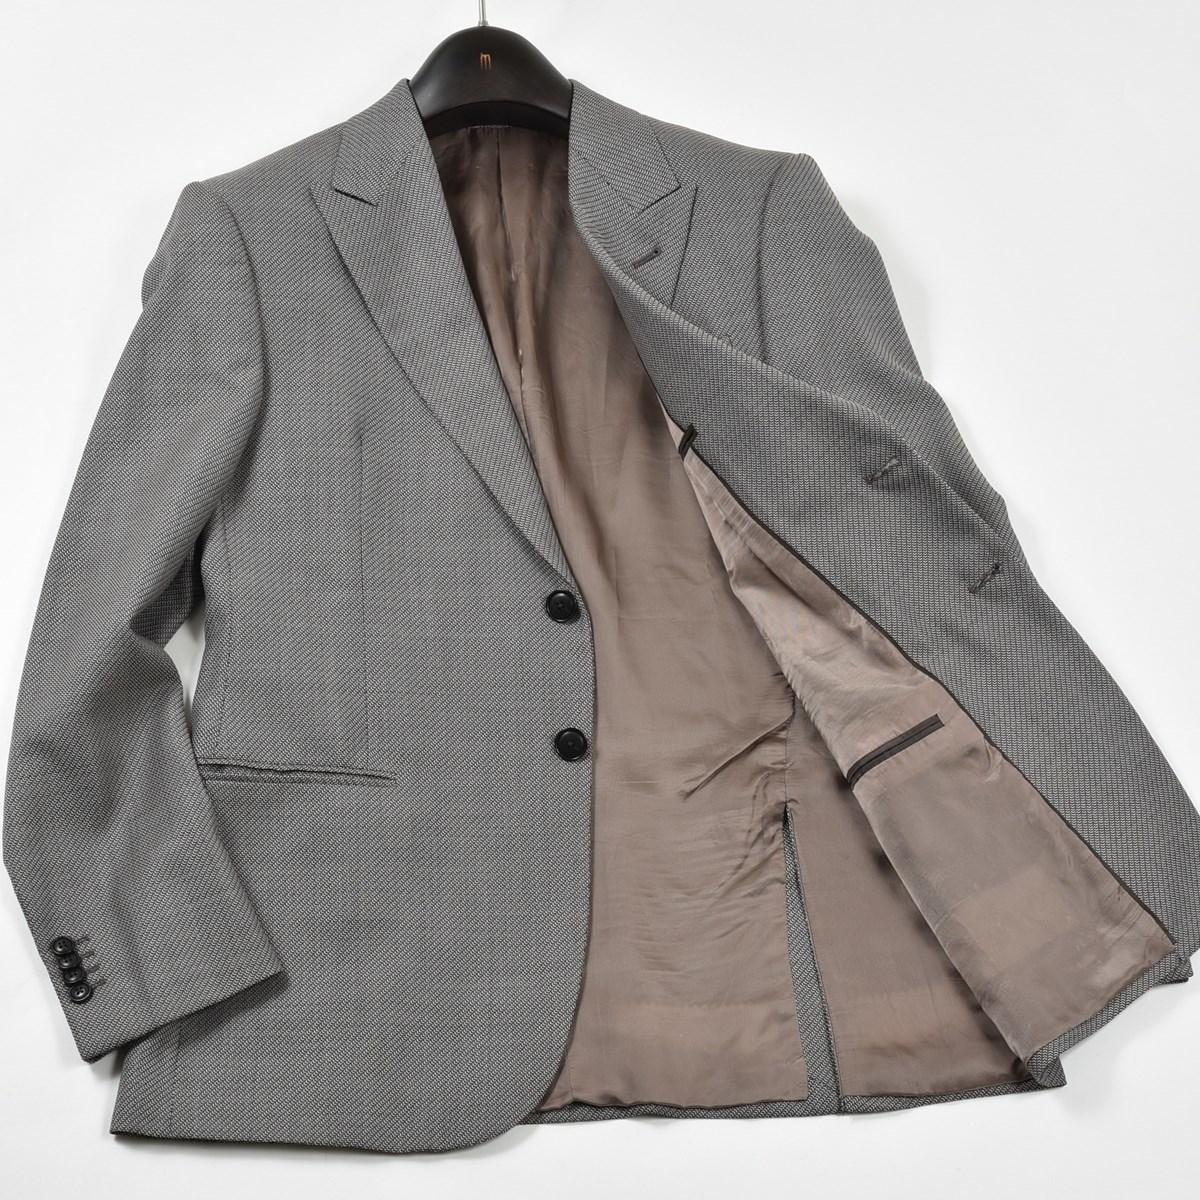 |GIORGIO ARMANI / アルマーニ|上品な装いに☆ シルク混 テーラードジャケット グレンチェック グレー 50サイズ イタリア製 B33